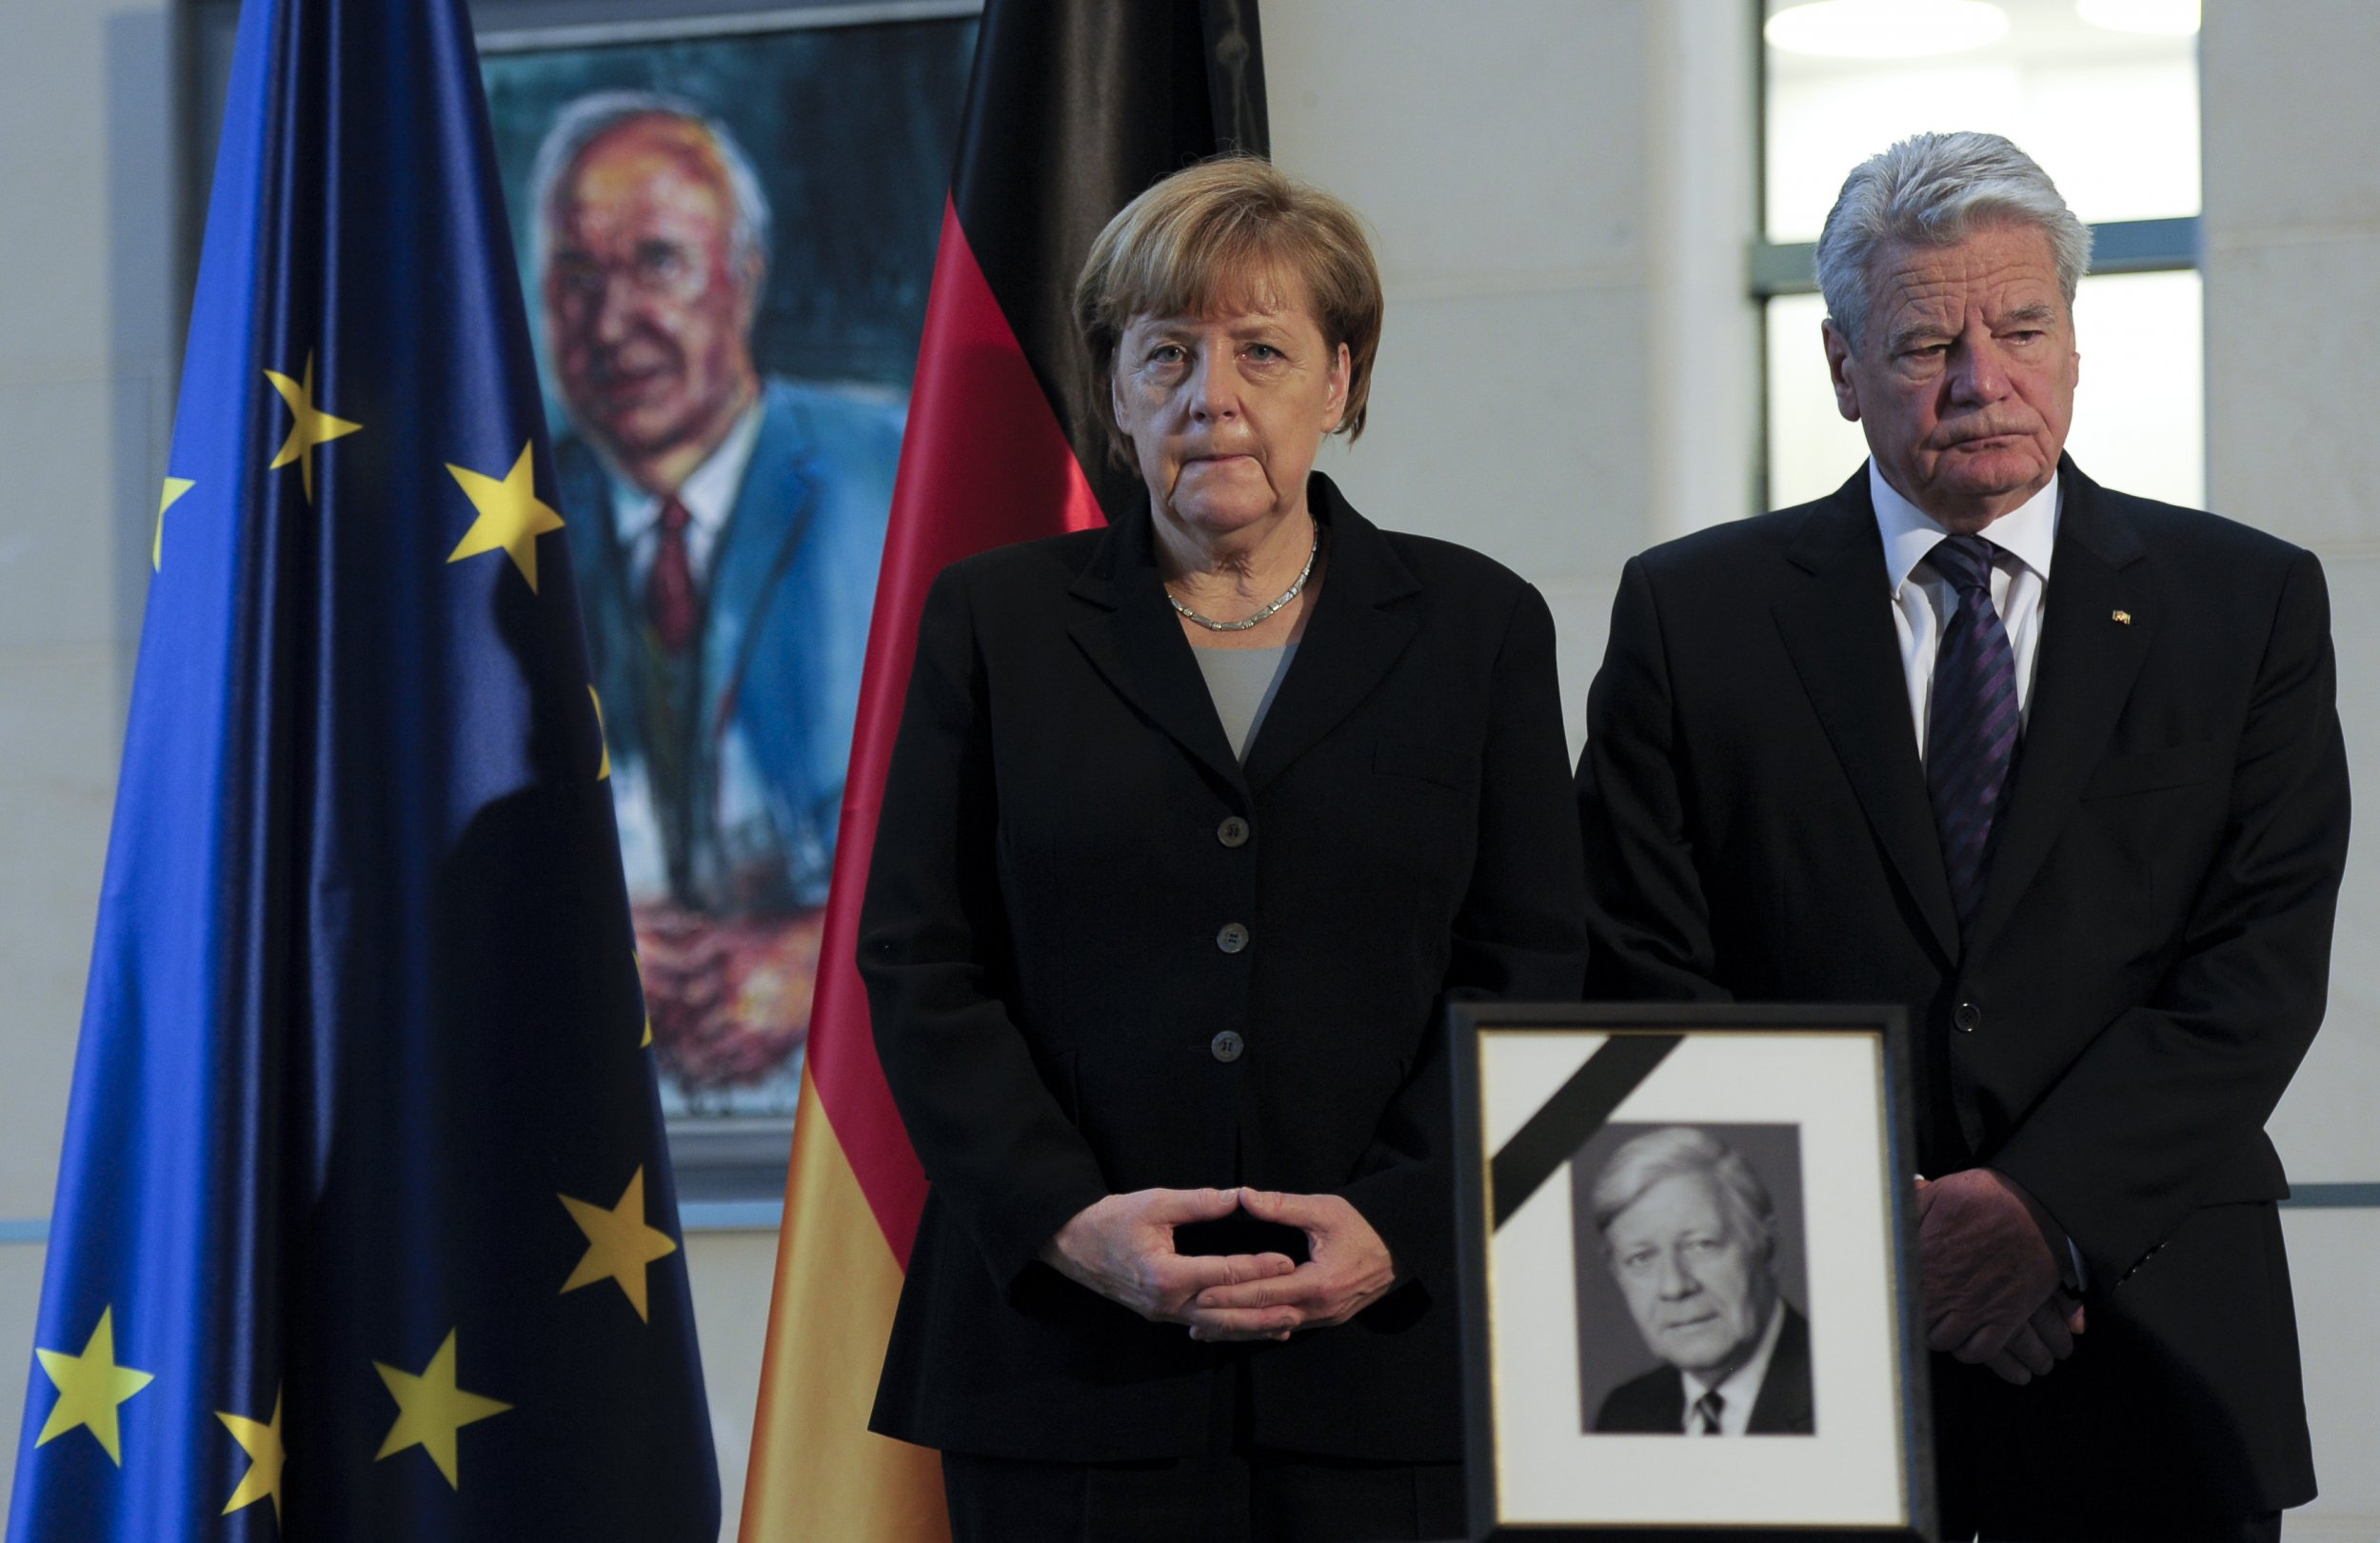 Joachim Gauck (R) and Angela Merkel (L)